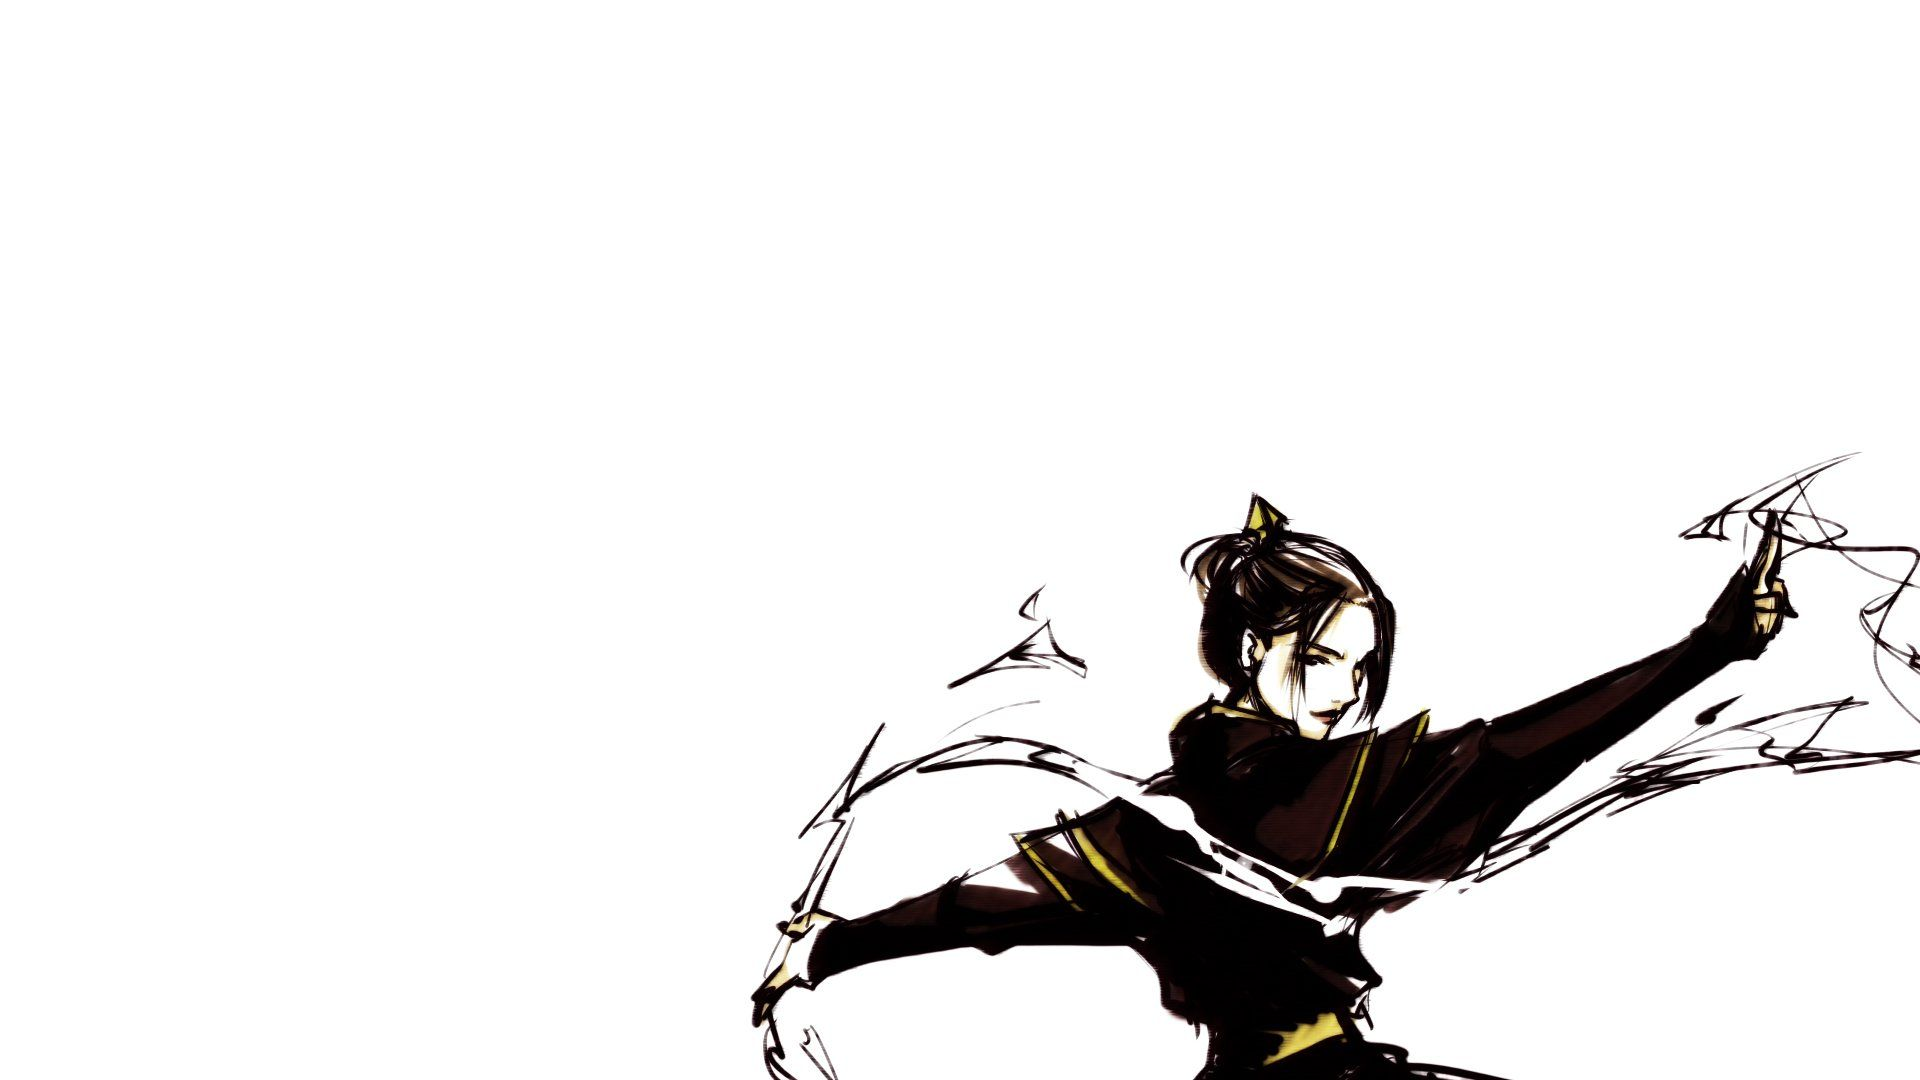 Avatar The Last Airbender Kartun - HD Wallpaper